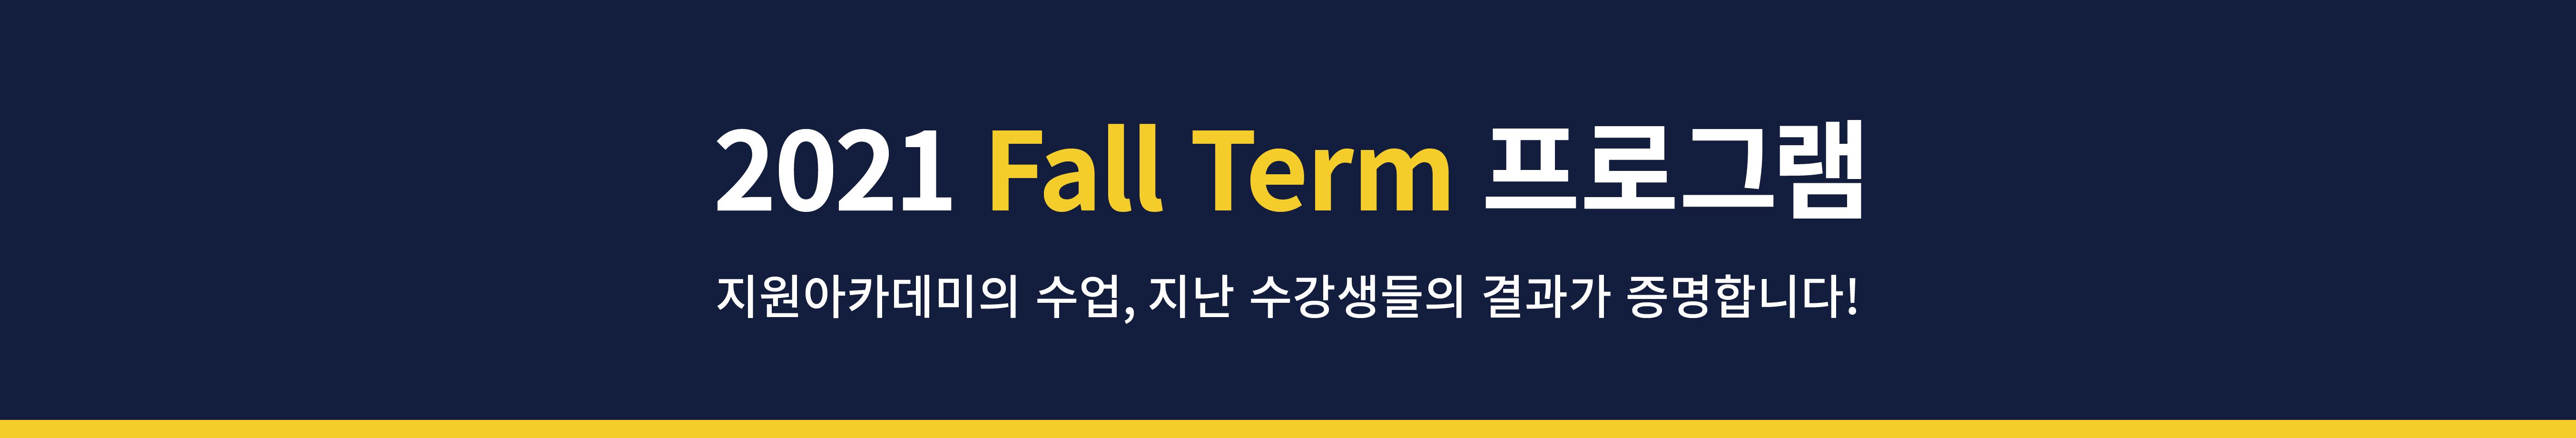 fall term SAT header